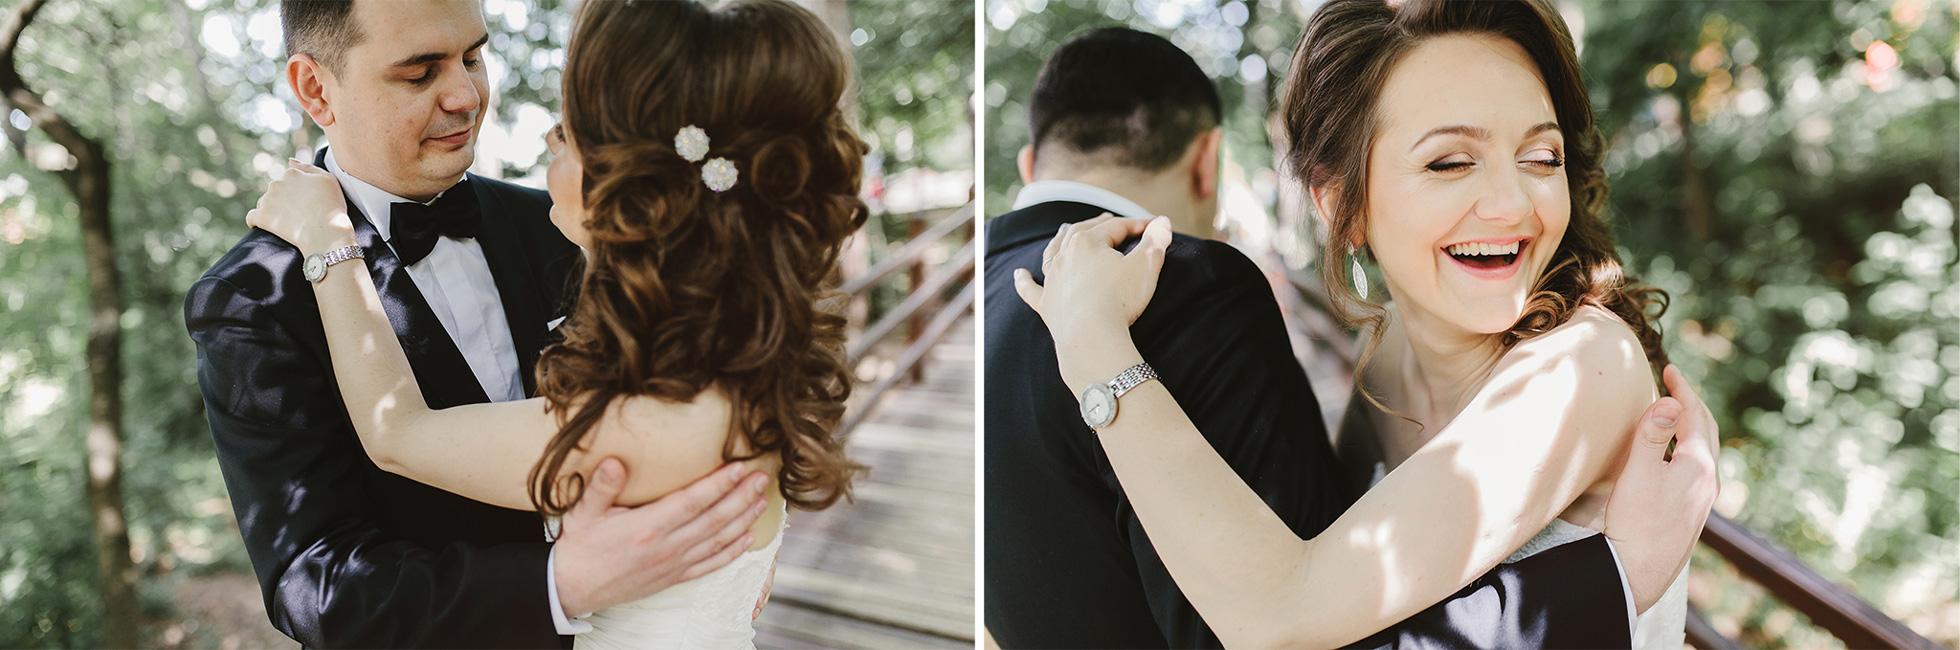 Liana-+-Florin-{wedding}-045